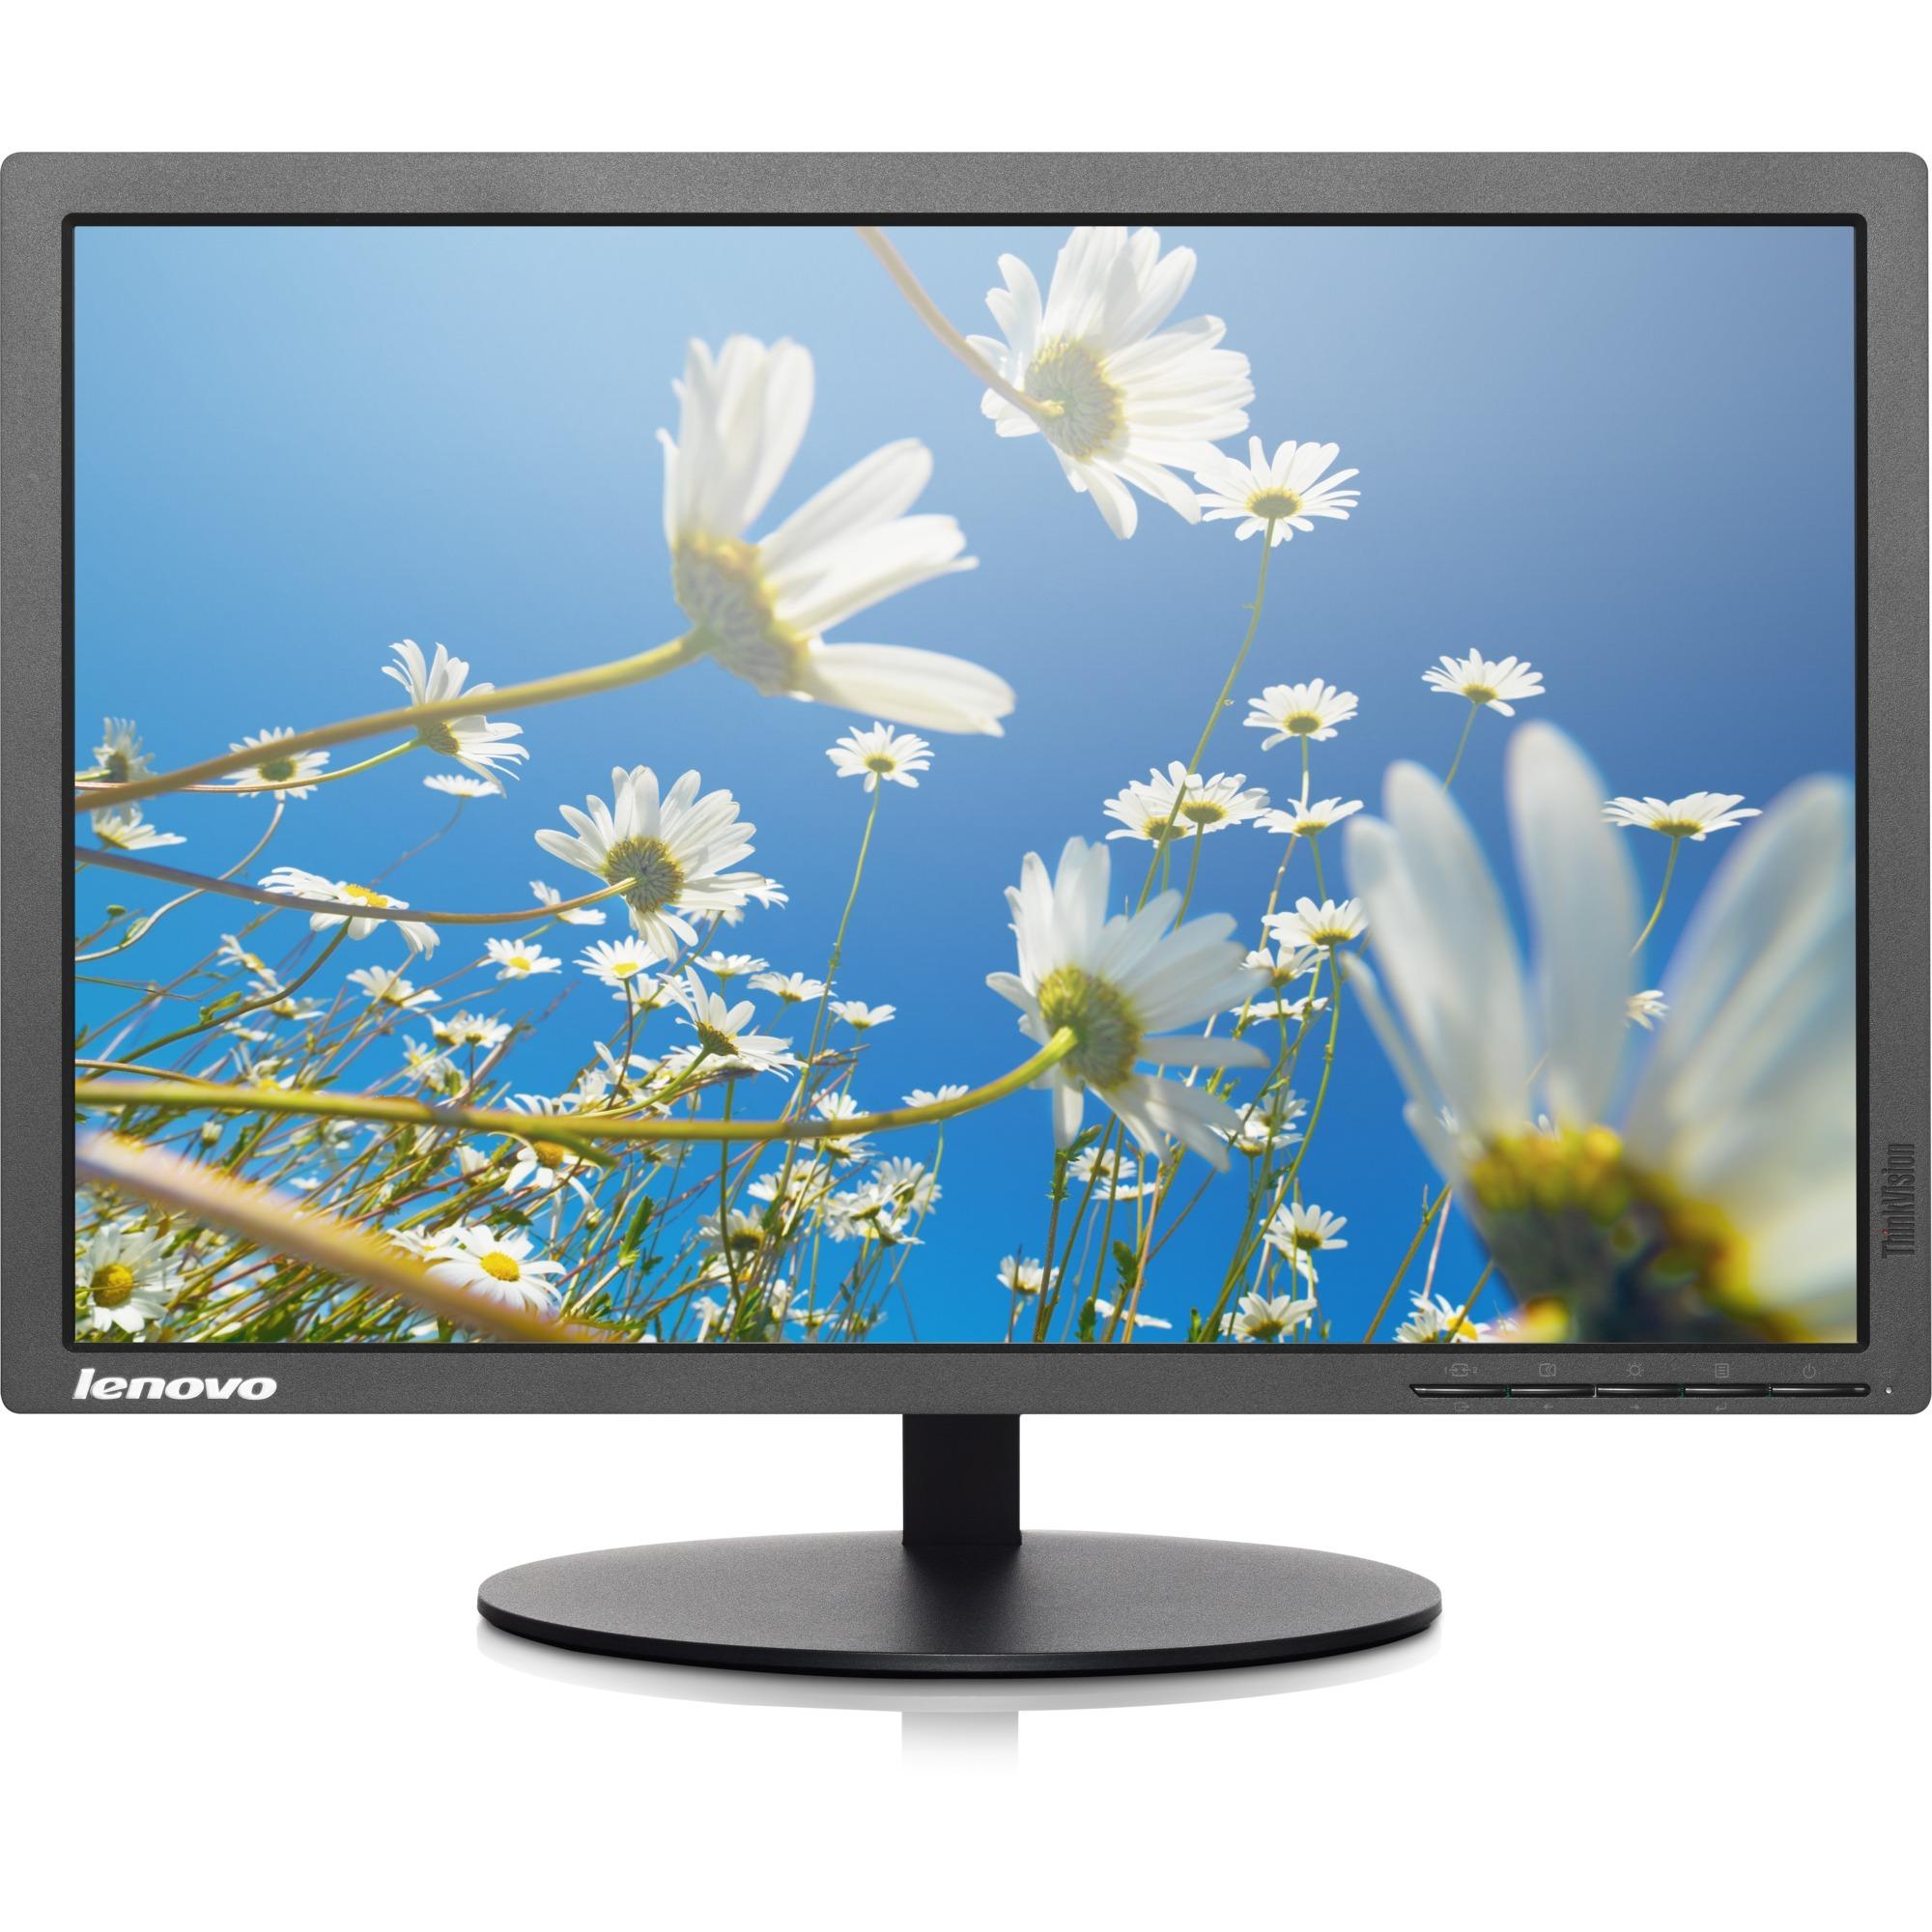 ThinkVision T2054P 19.5